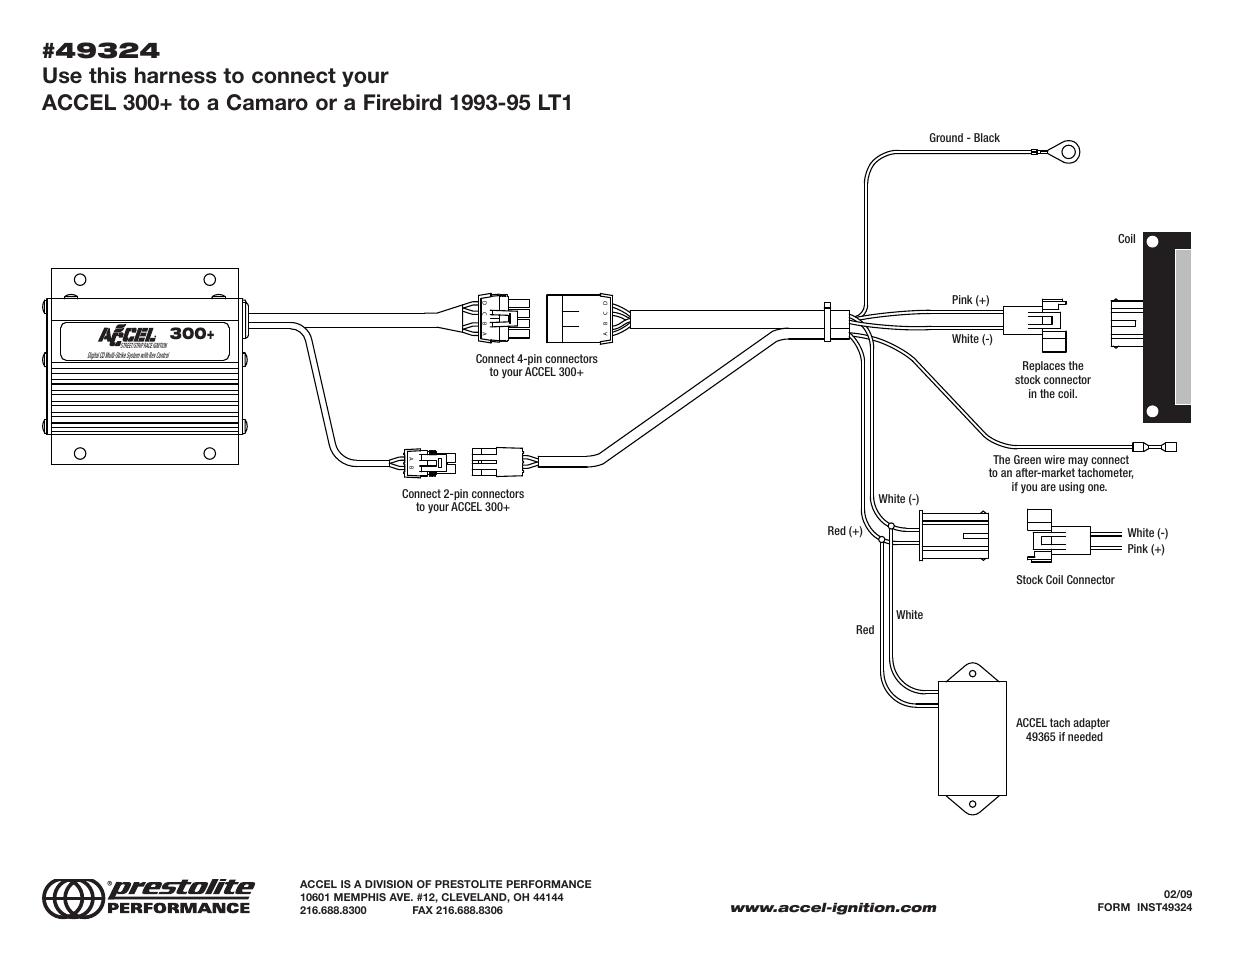 Inspiring Mallory Hyfire Wiring Diagram septic field diagram on